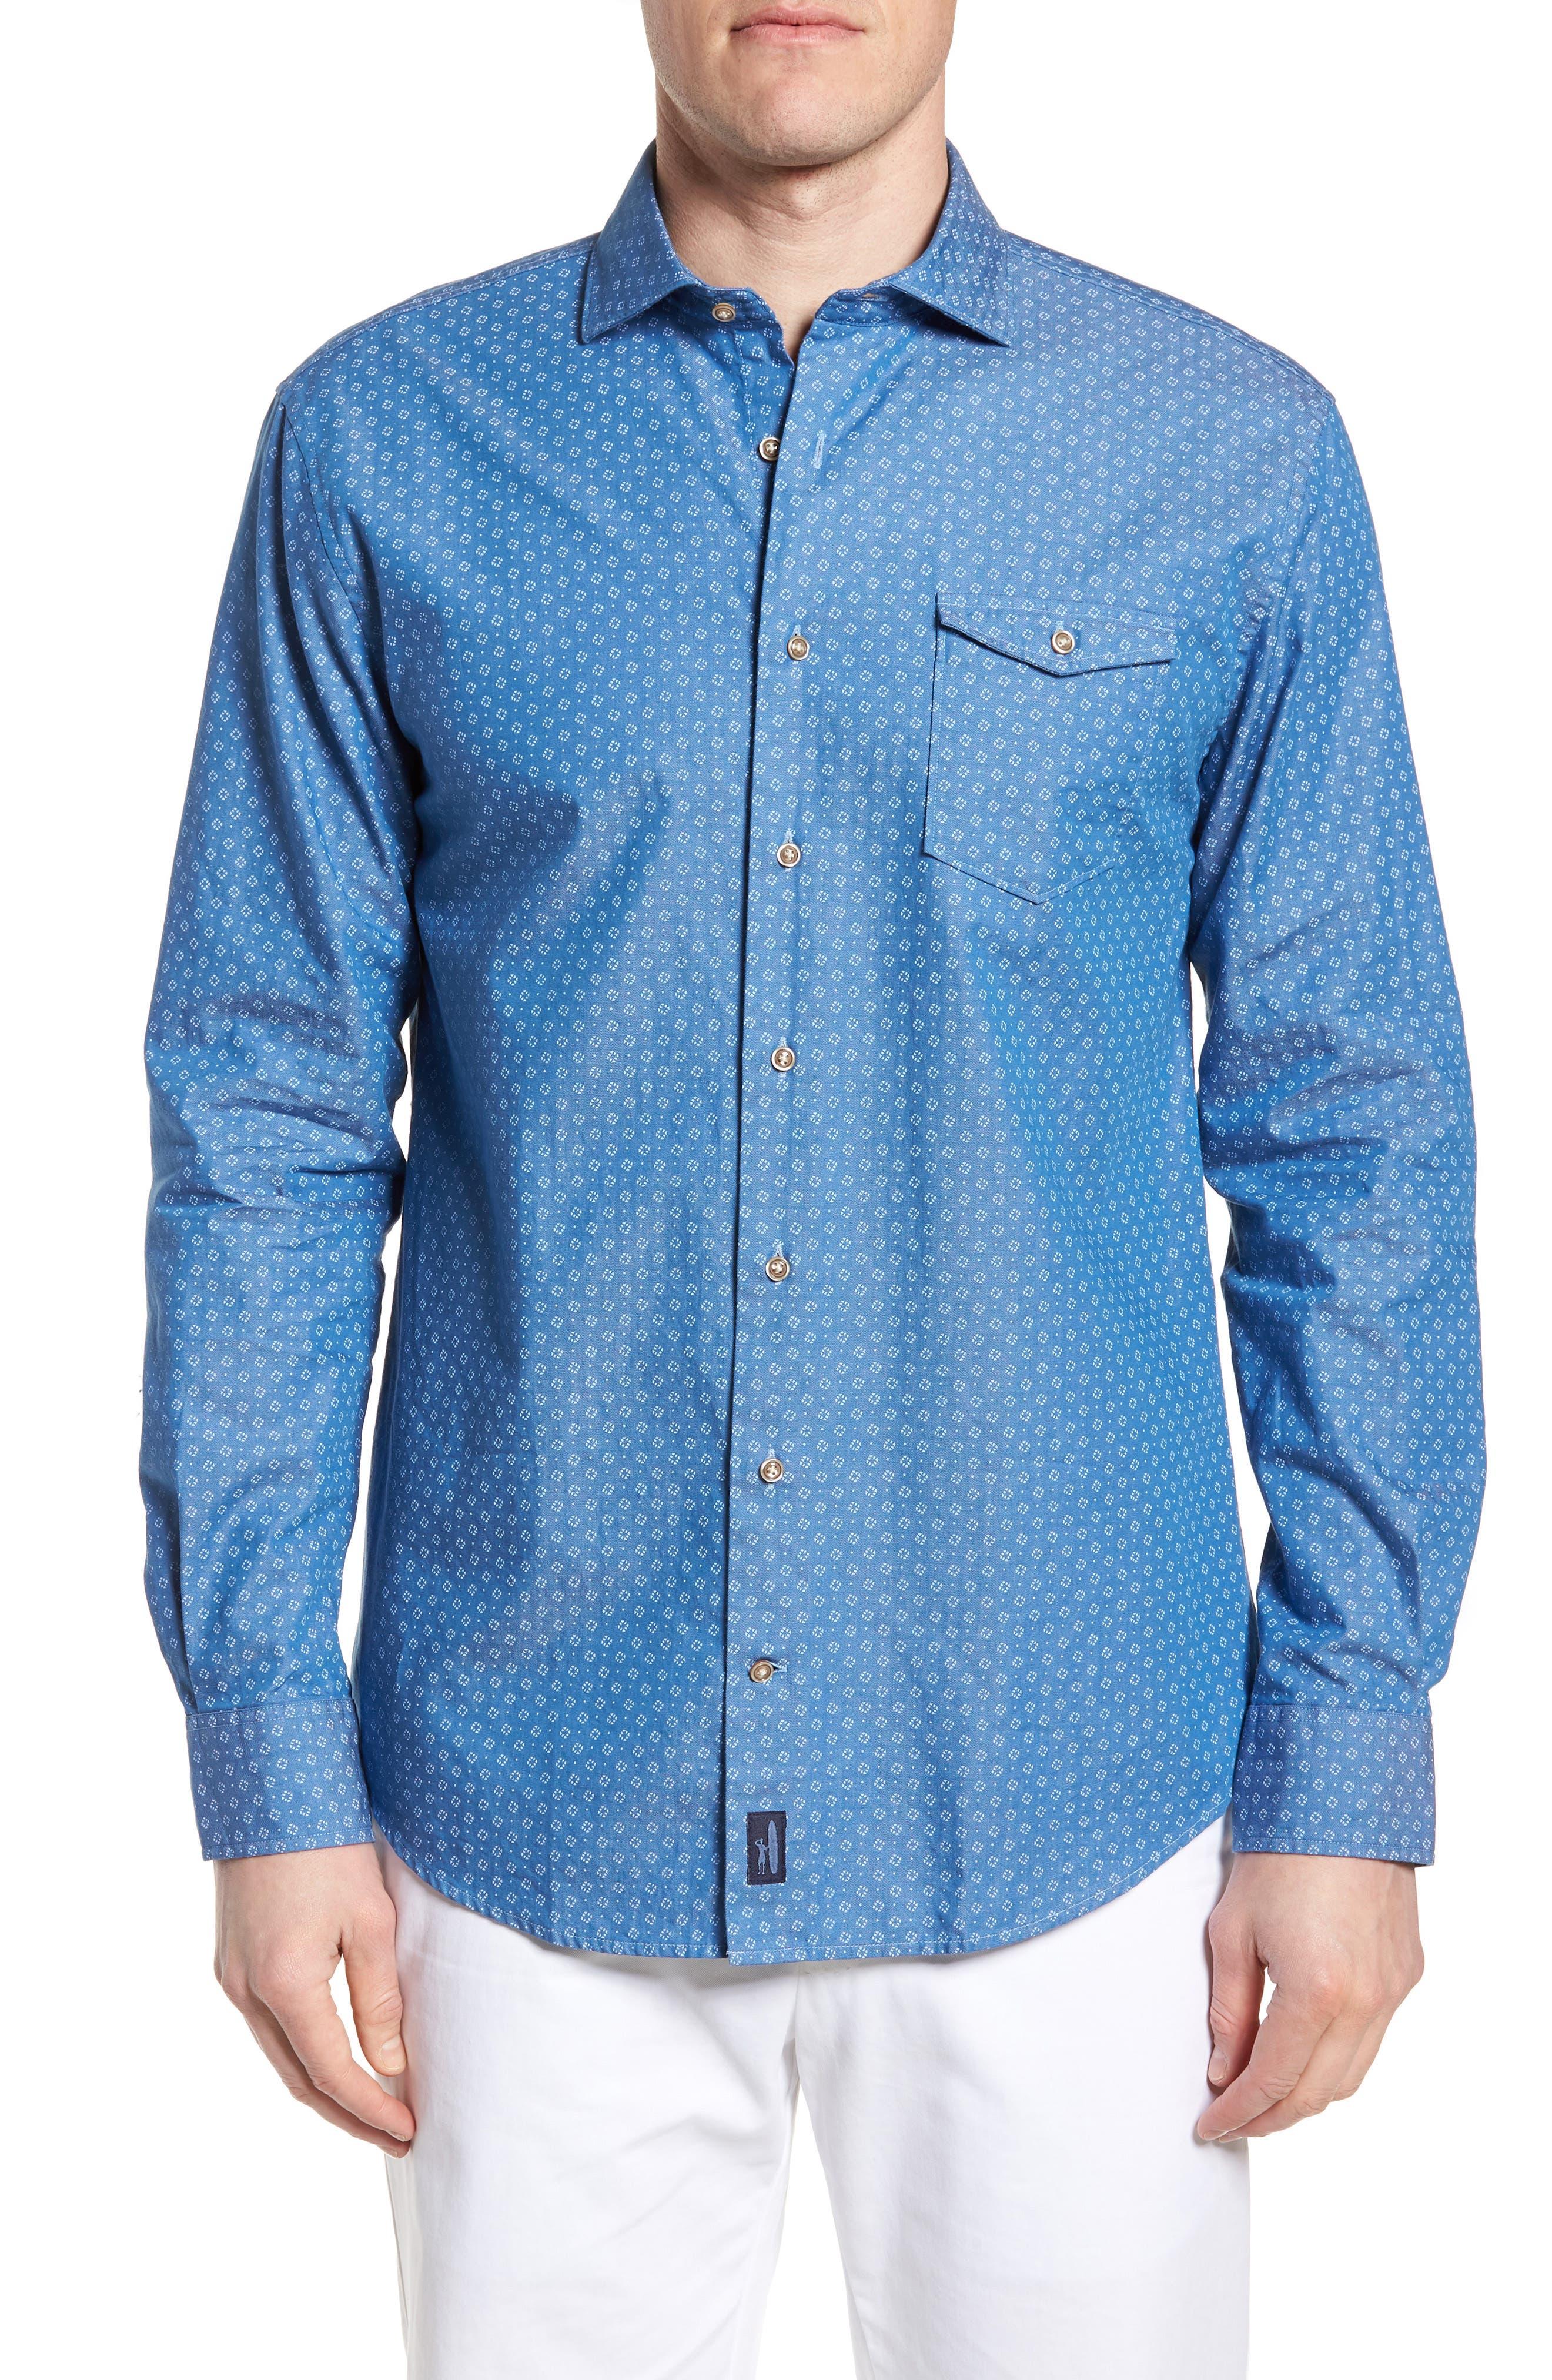 Barclay Regular Fit Sport Shirt,                             Main thumbnail 1, color,                             250